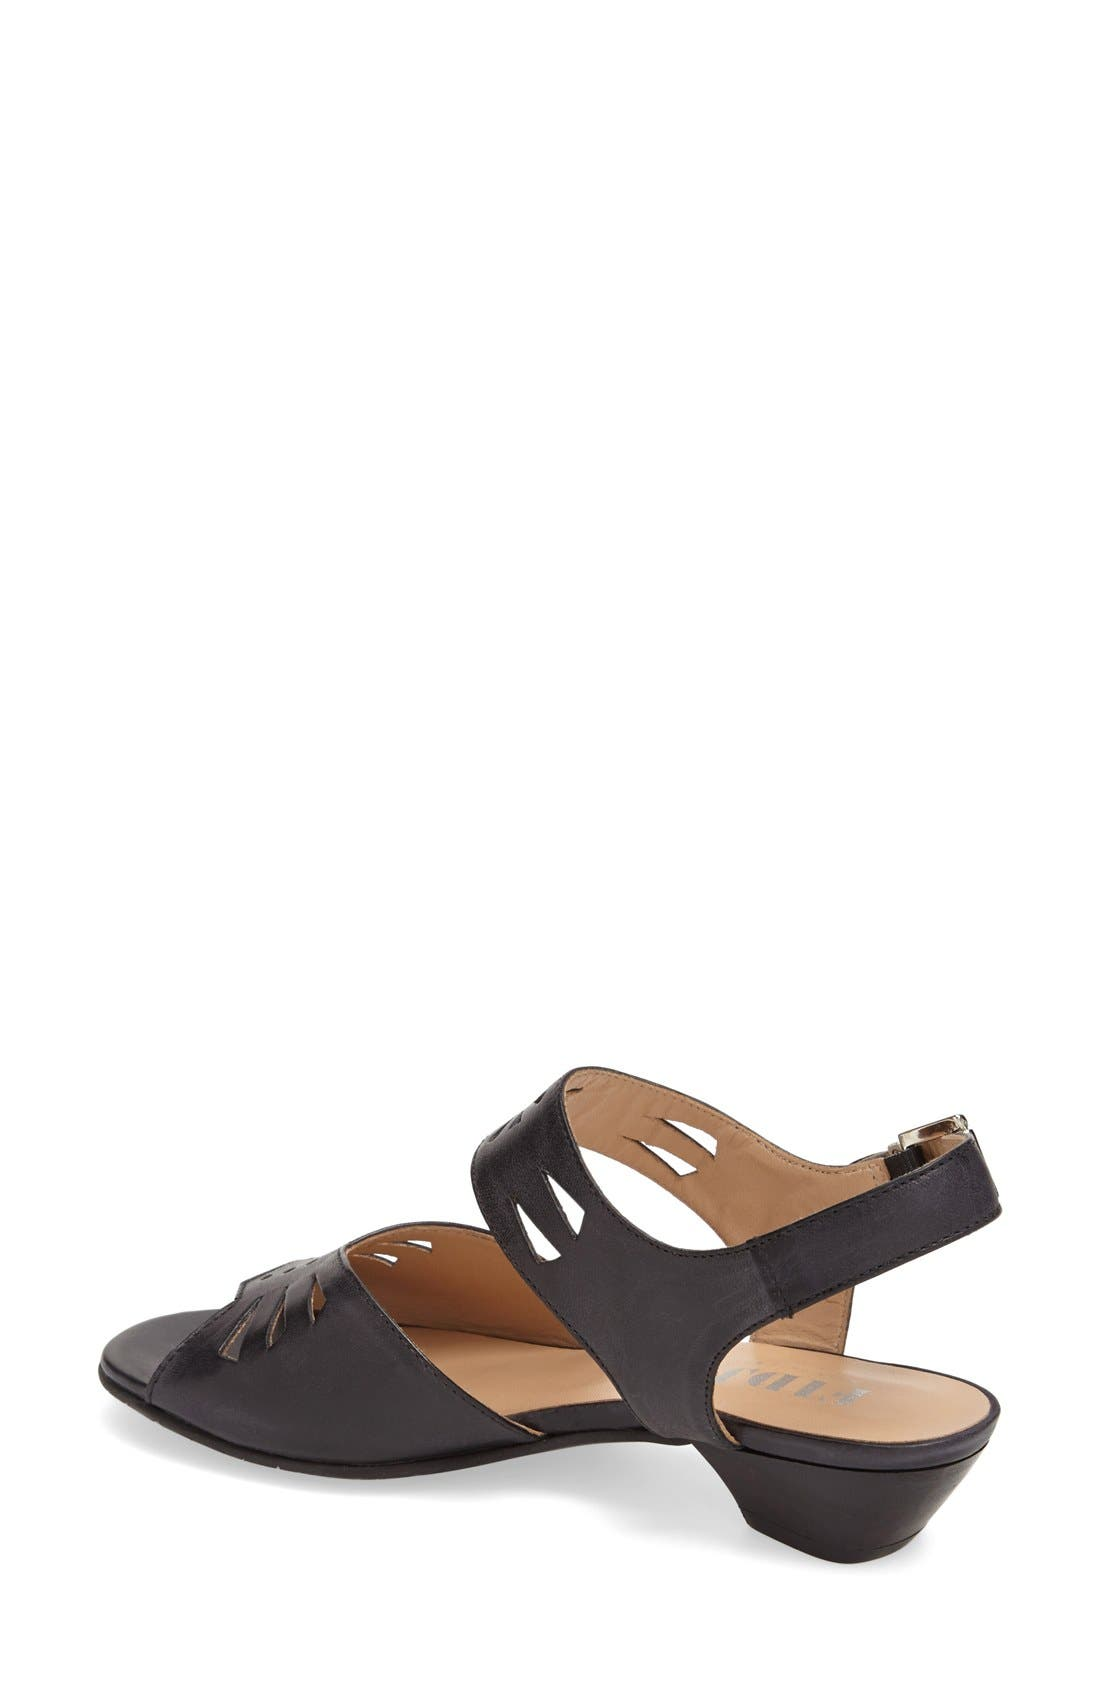 'V112' Perforated Leather Sandal,                             Alternate thumbnail 2, color,                             Black